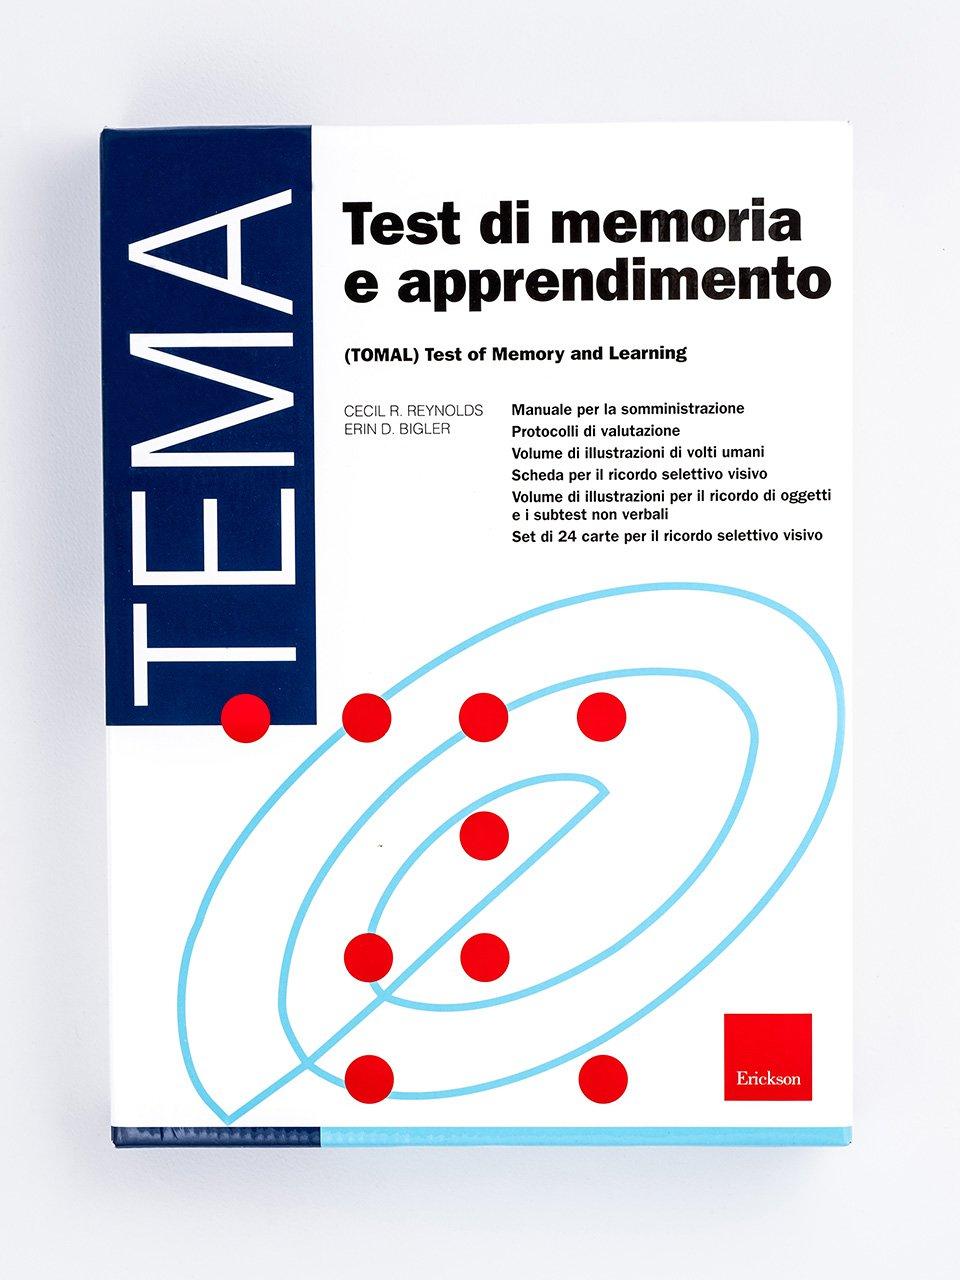 Test TEMA - Memoria e apprendimento - TACTOO - Giochi - Erickson